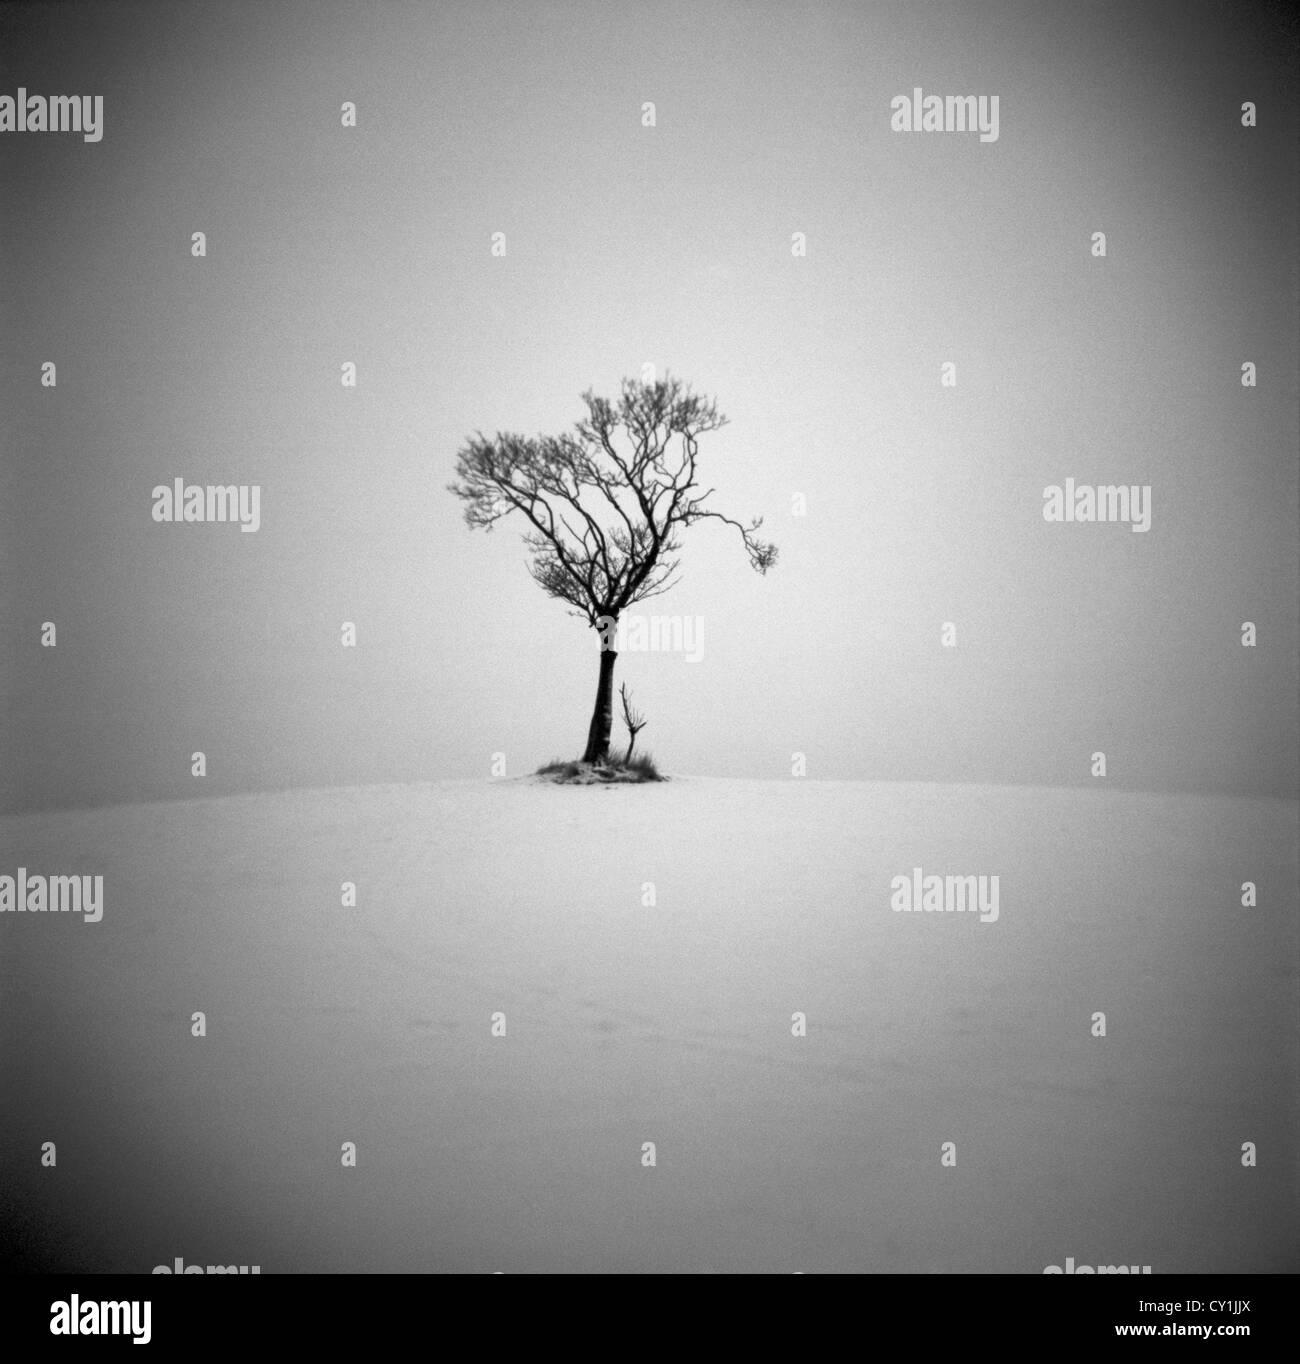 Lone tree in desert like environment - Stock Image